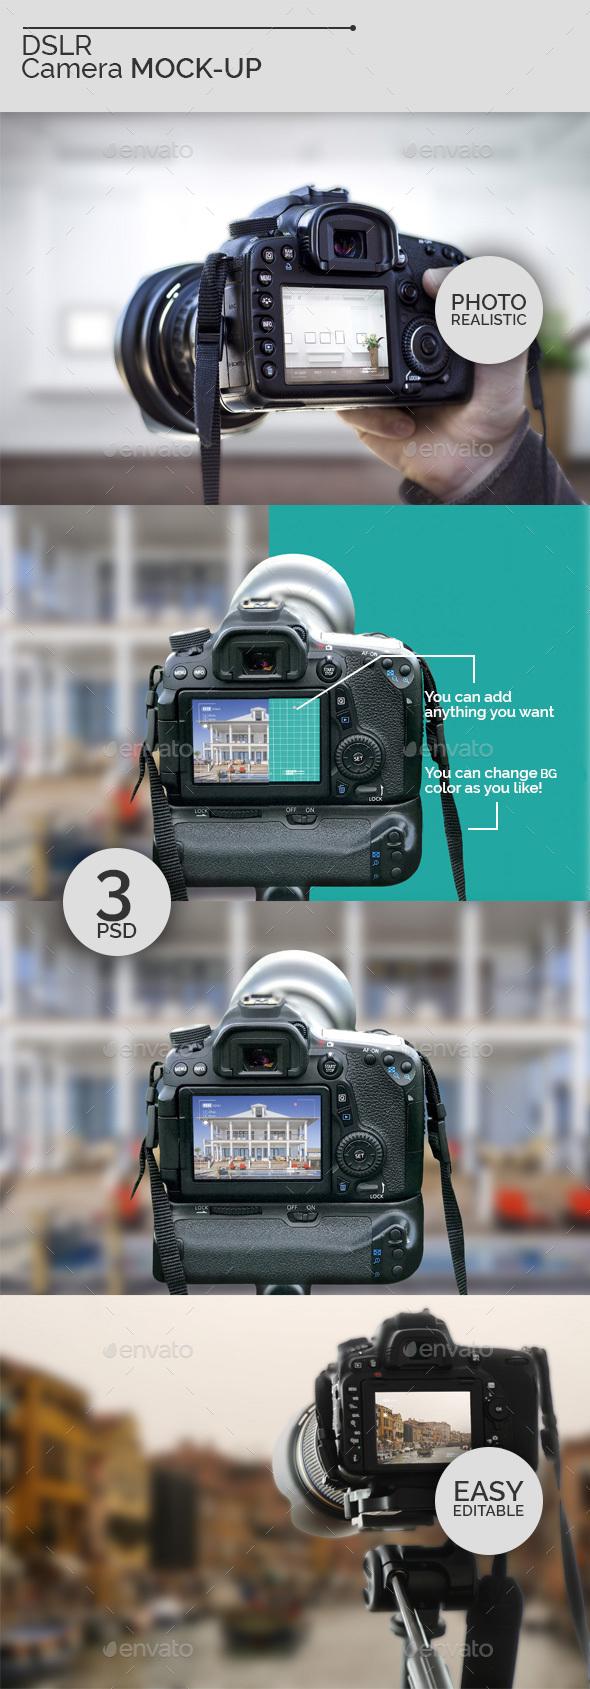 DSLR Camera Mock-Ups V2 - Miscellaneous Displays